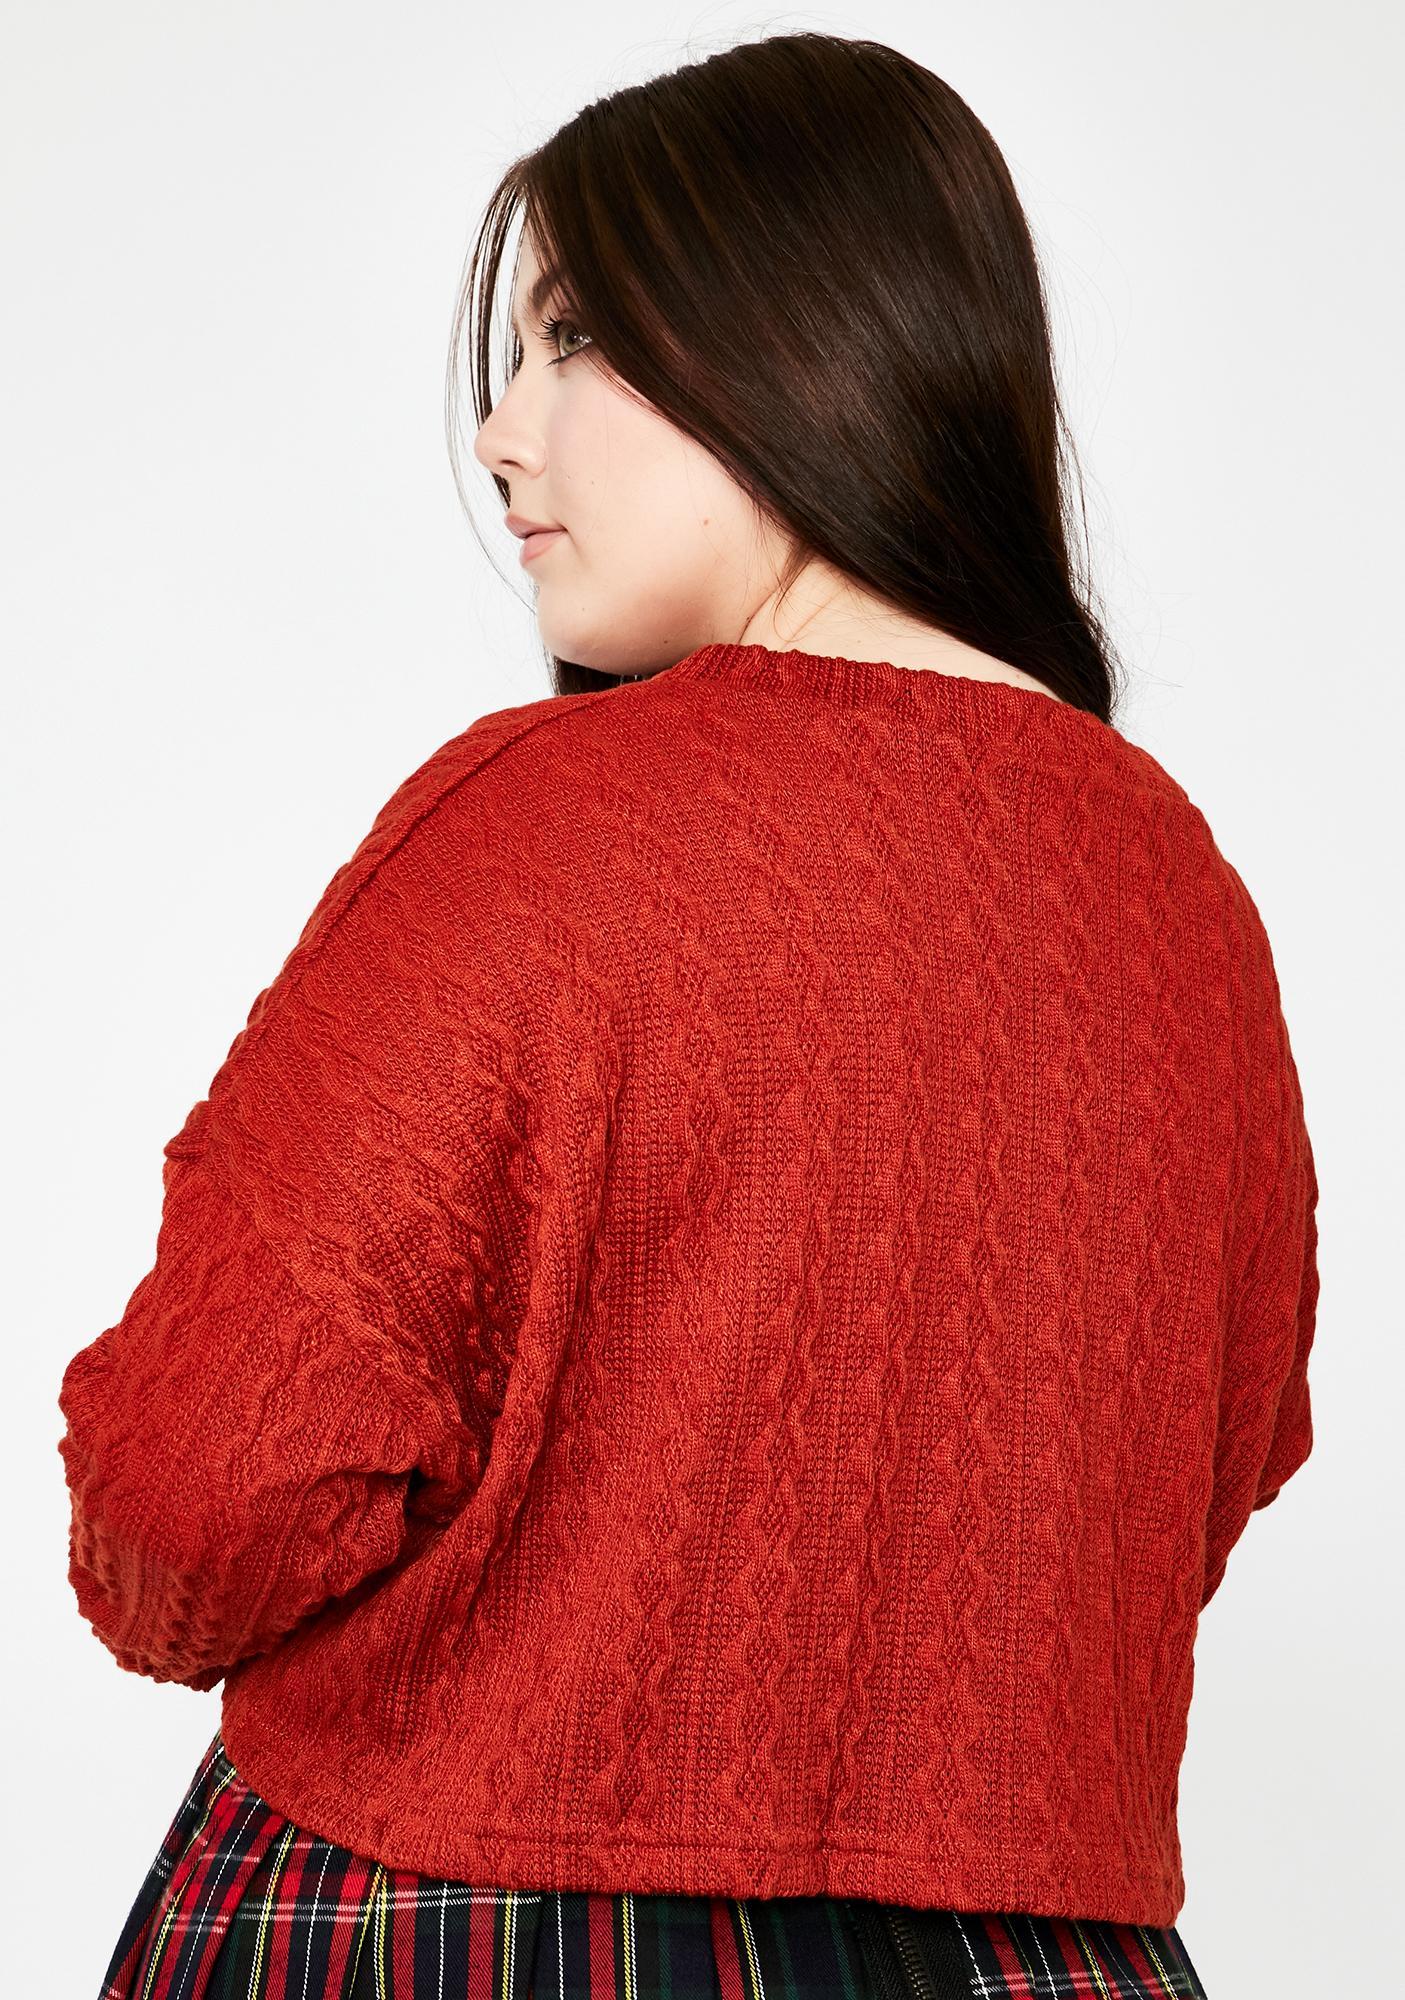 Luxe Tis The Season Knit Sweater